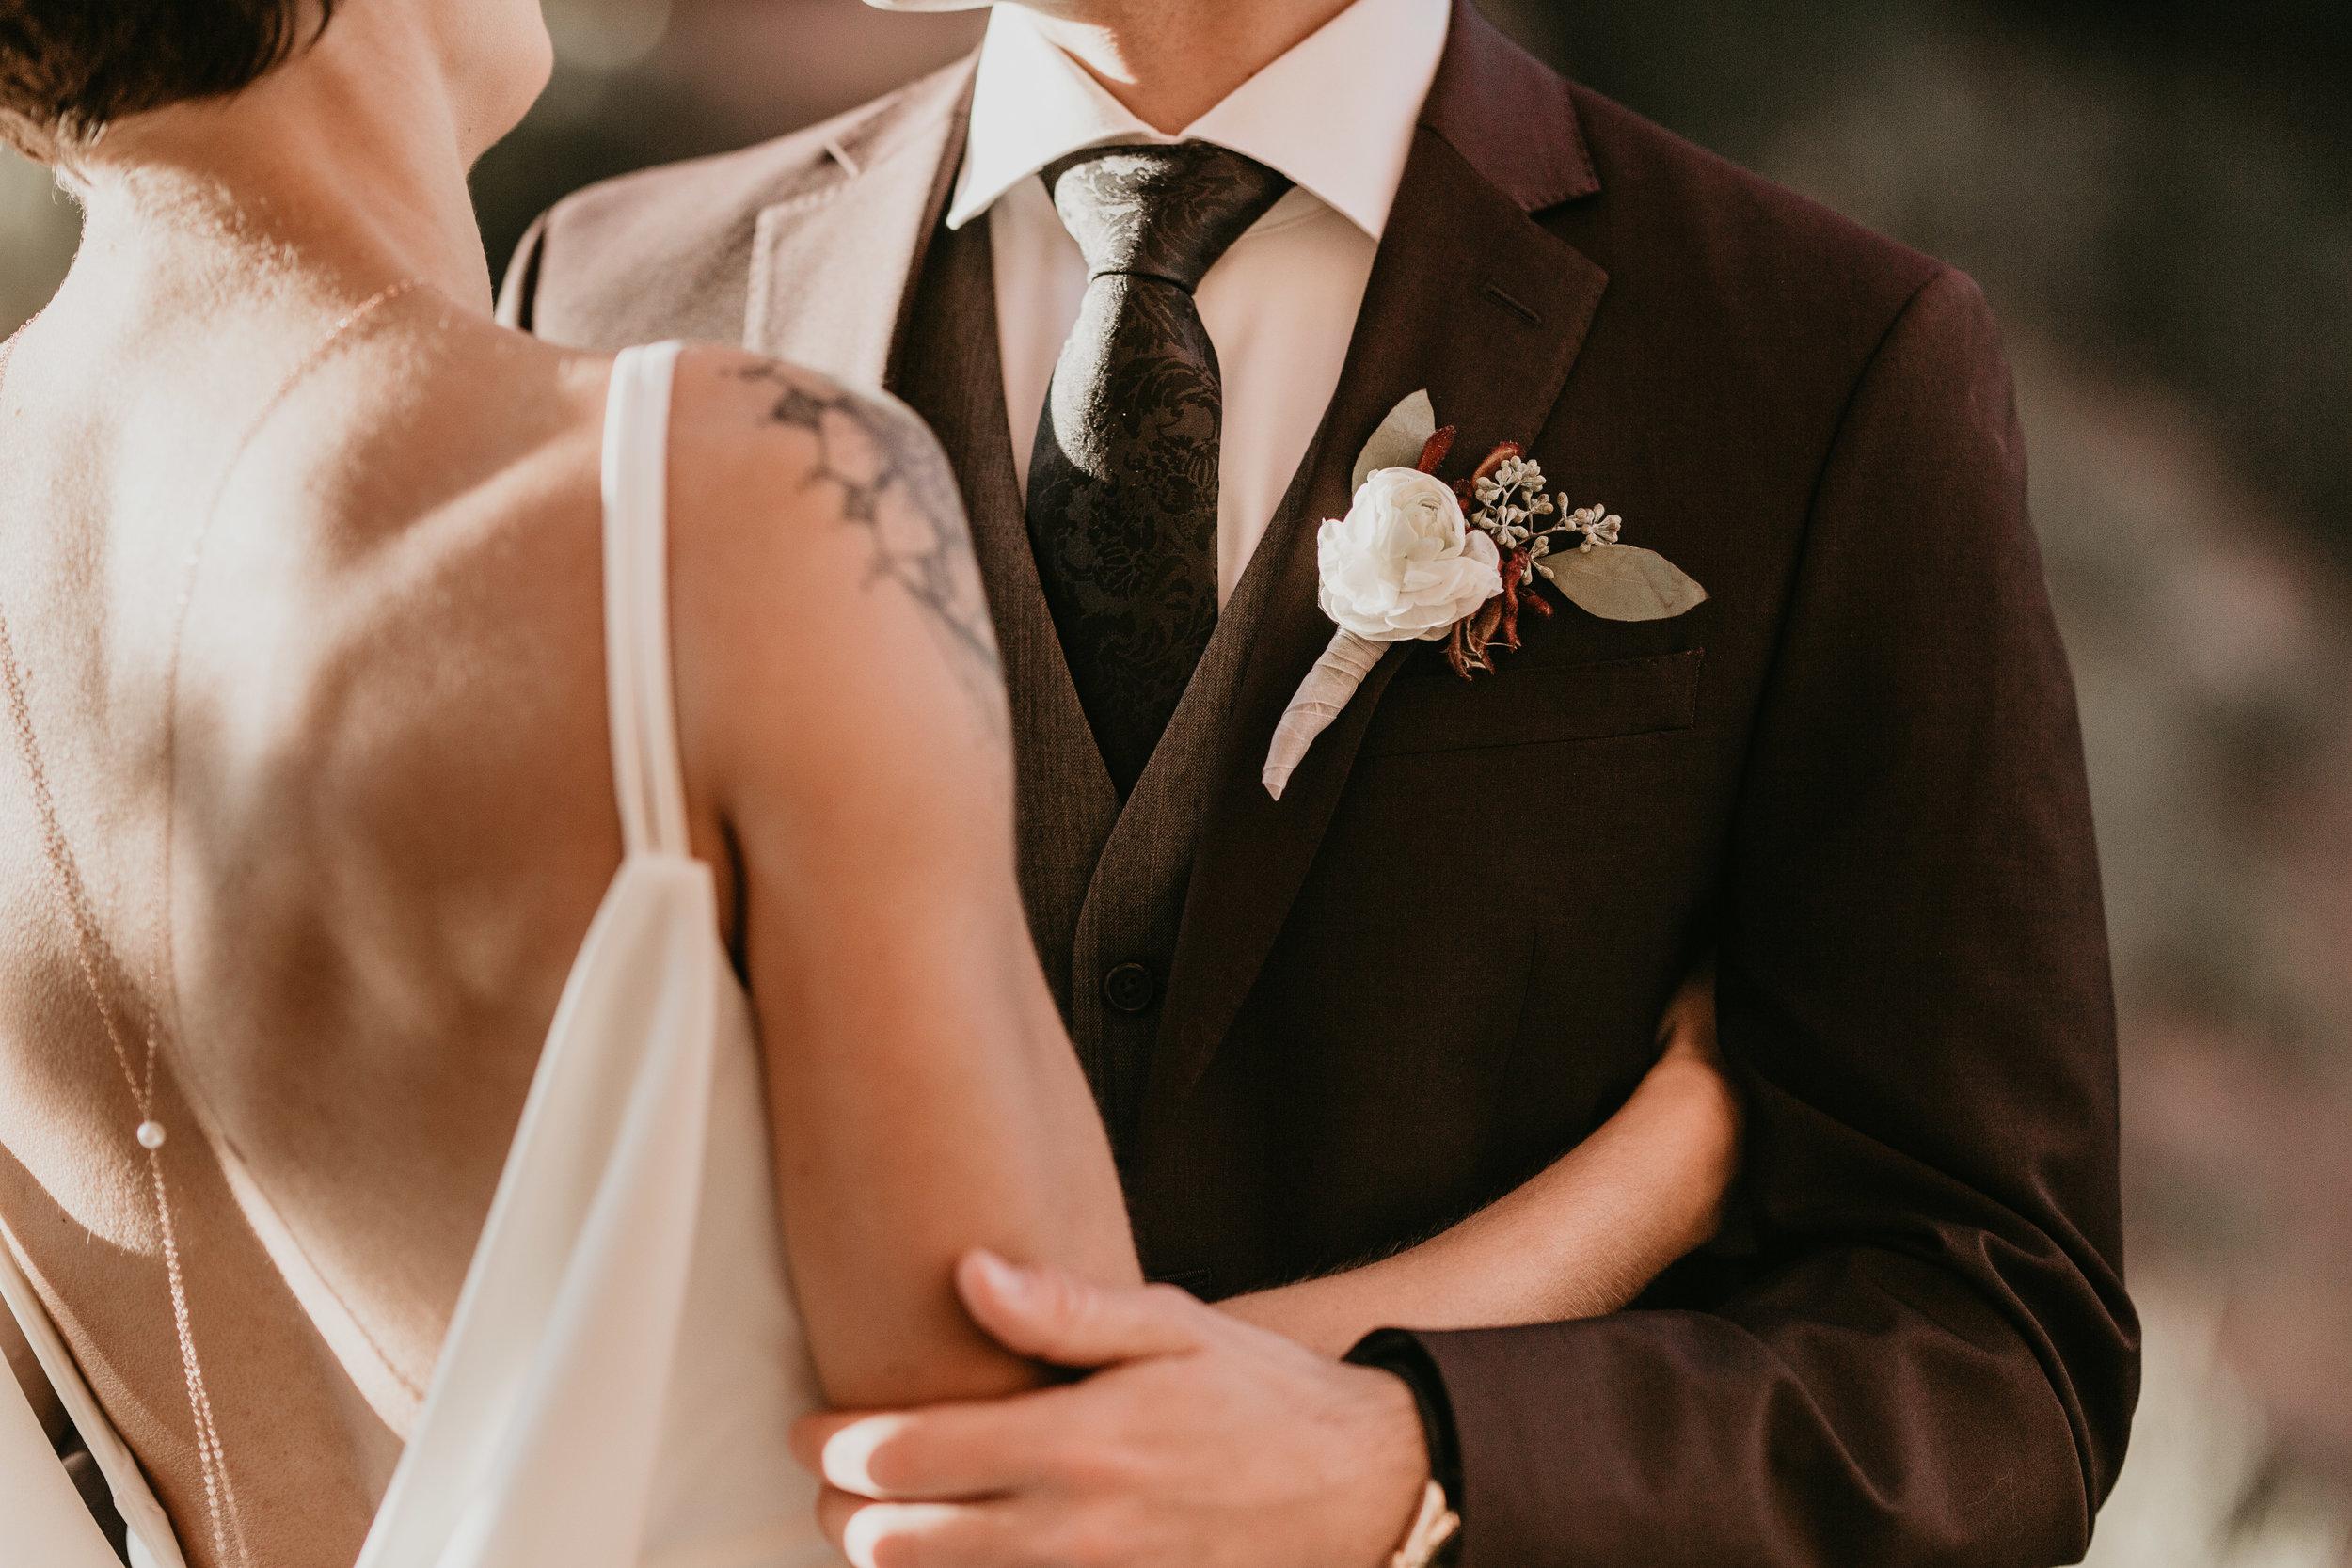 nicole-daacke-photography-sedona-arizona-destination-elopement-wedding-photographer-catherdral-rock-hiking-elopement-sedona-river-elopement-photos-desert-rock-wedding-photographer-laid-back-spontaneous-elopement-56.jpg